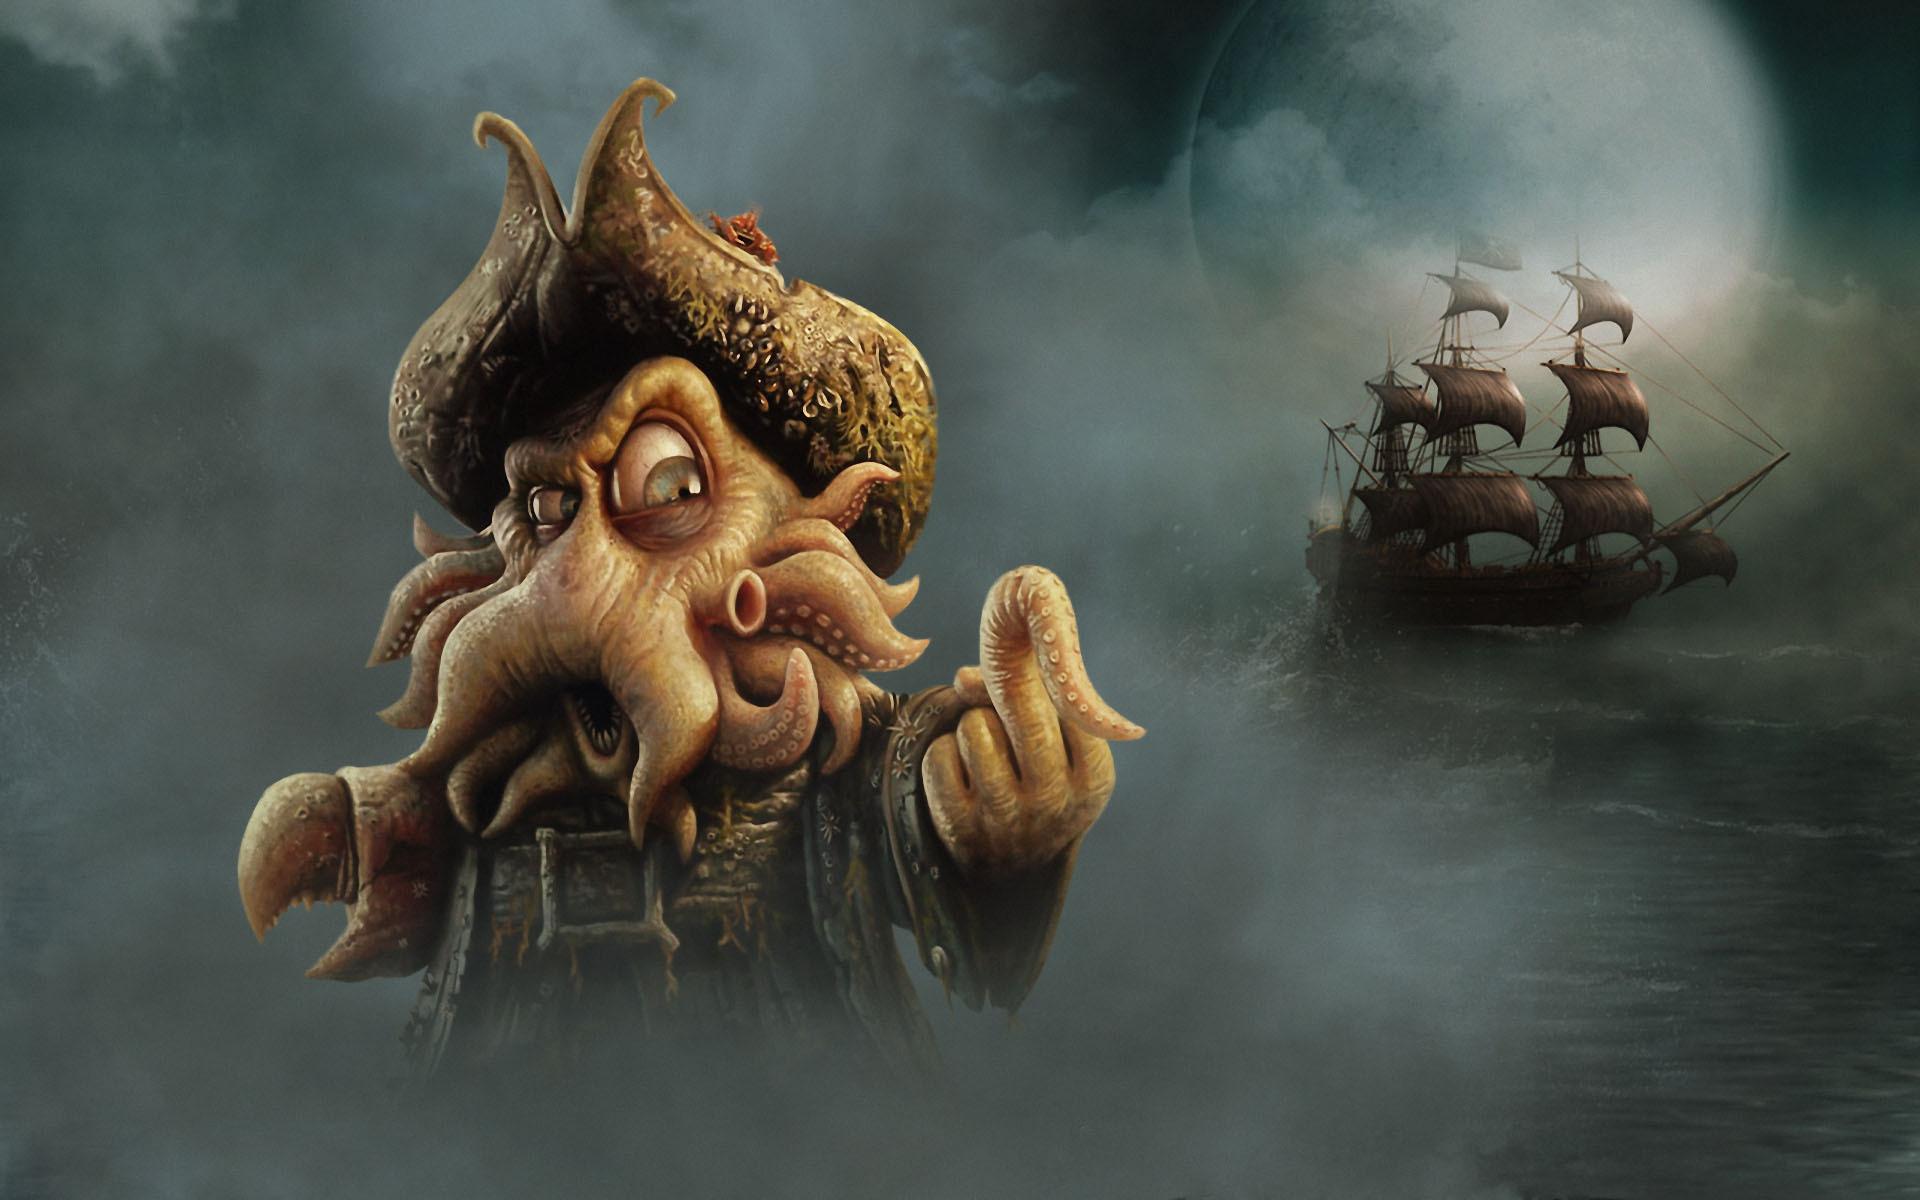 piraten games pc